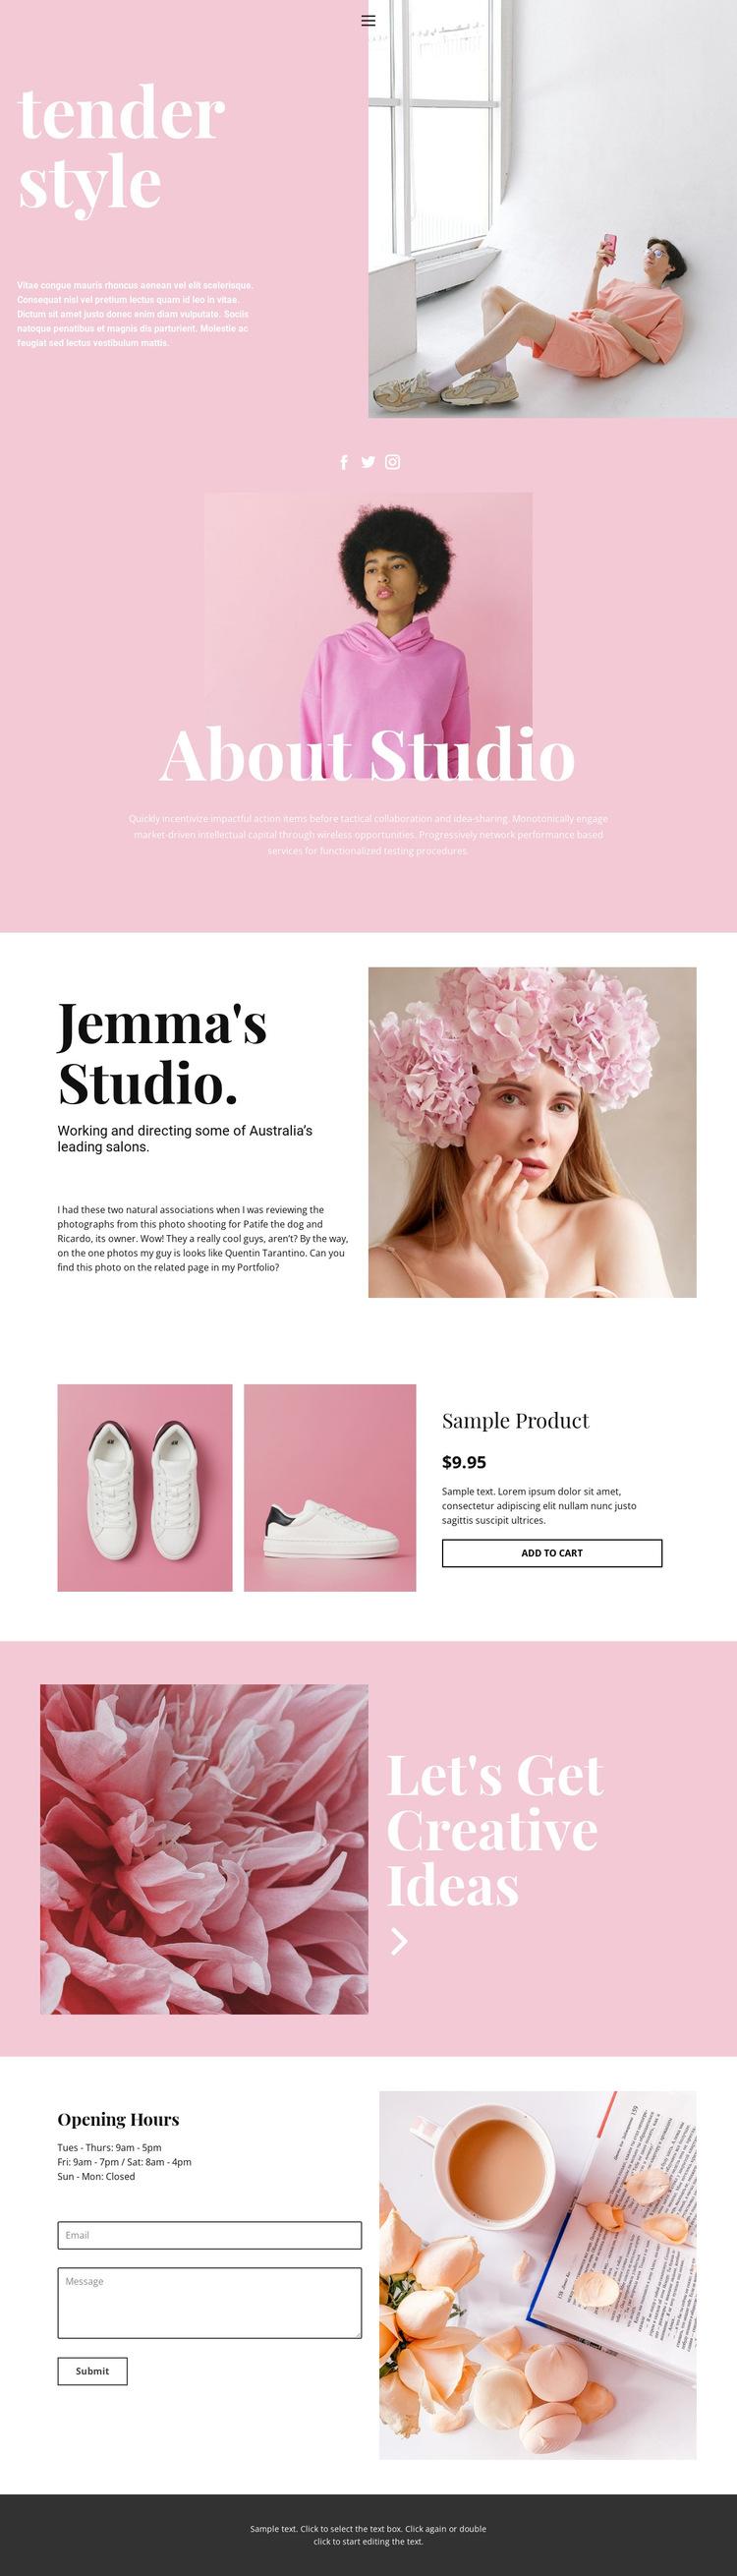 Fashion news HTML5 Template